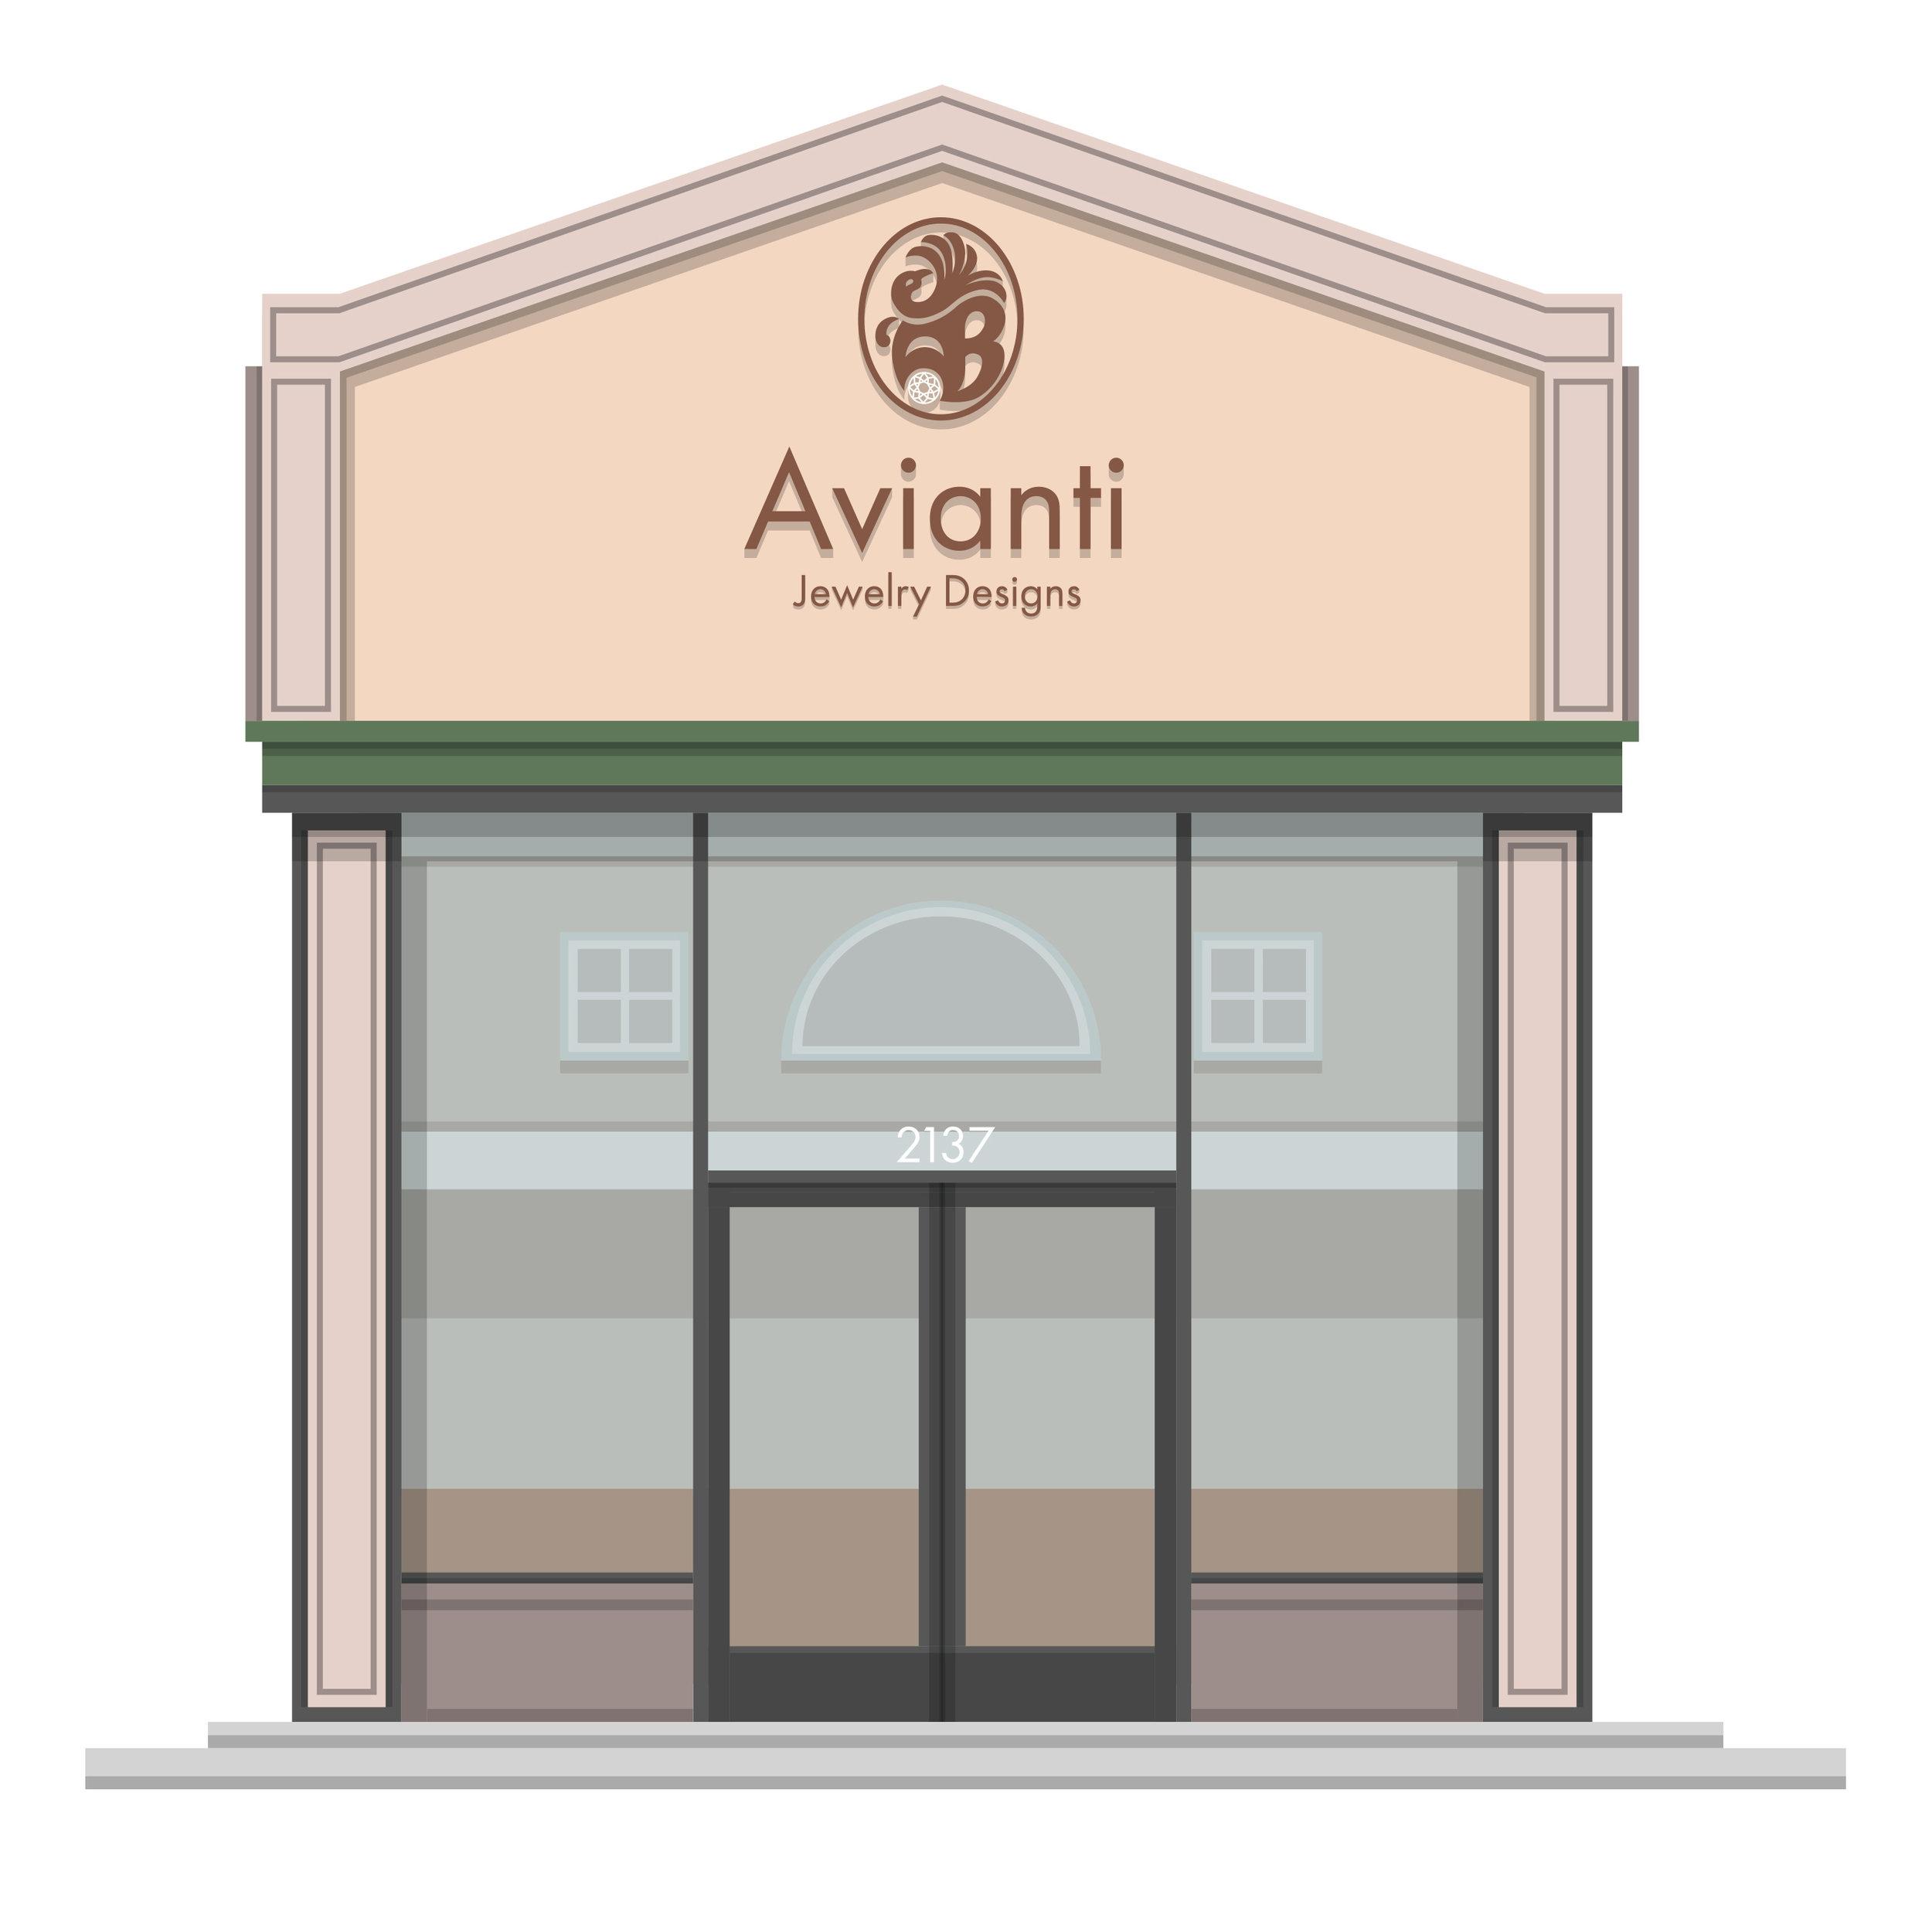 Avianti-Jewelers-1.jpg